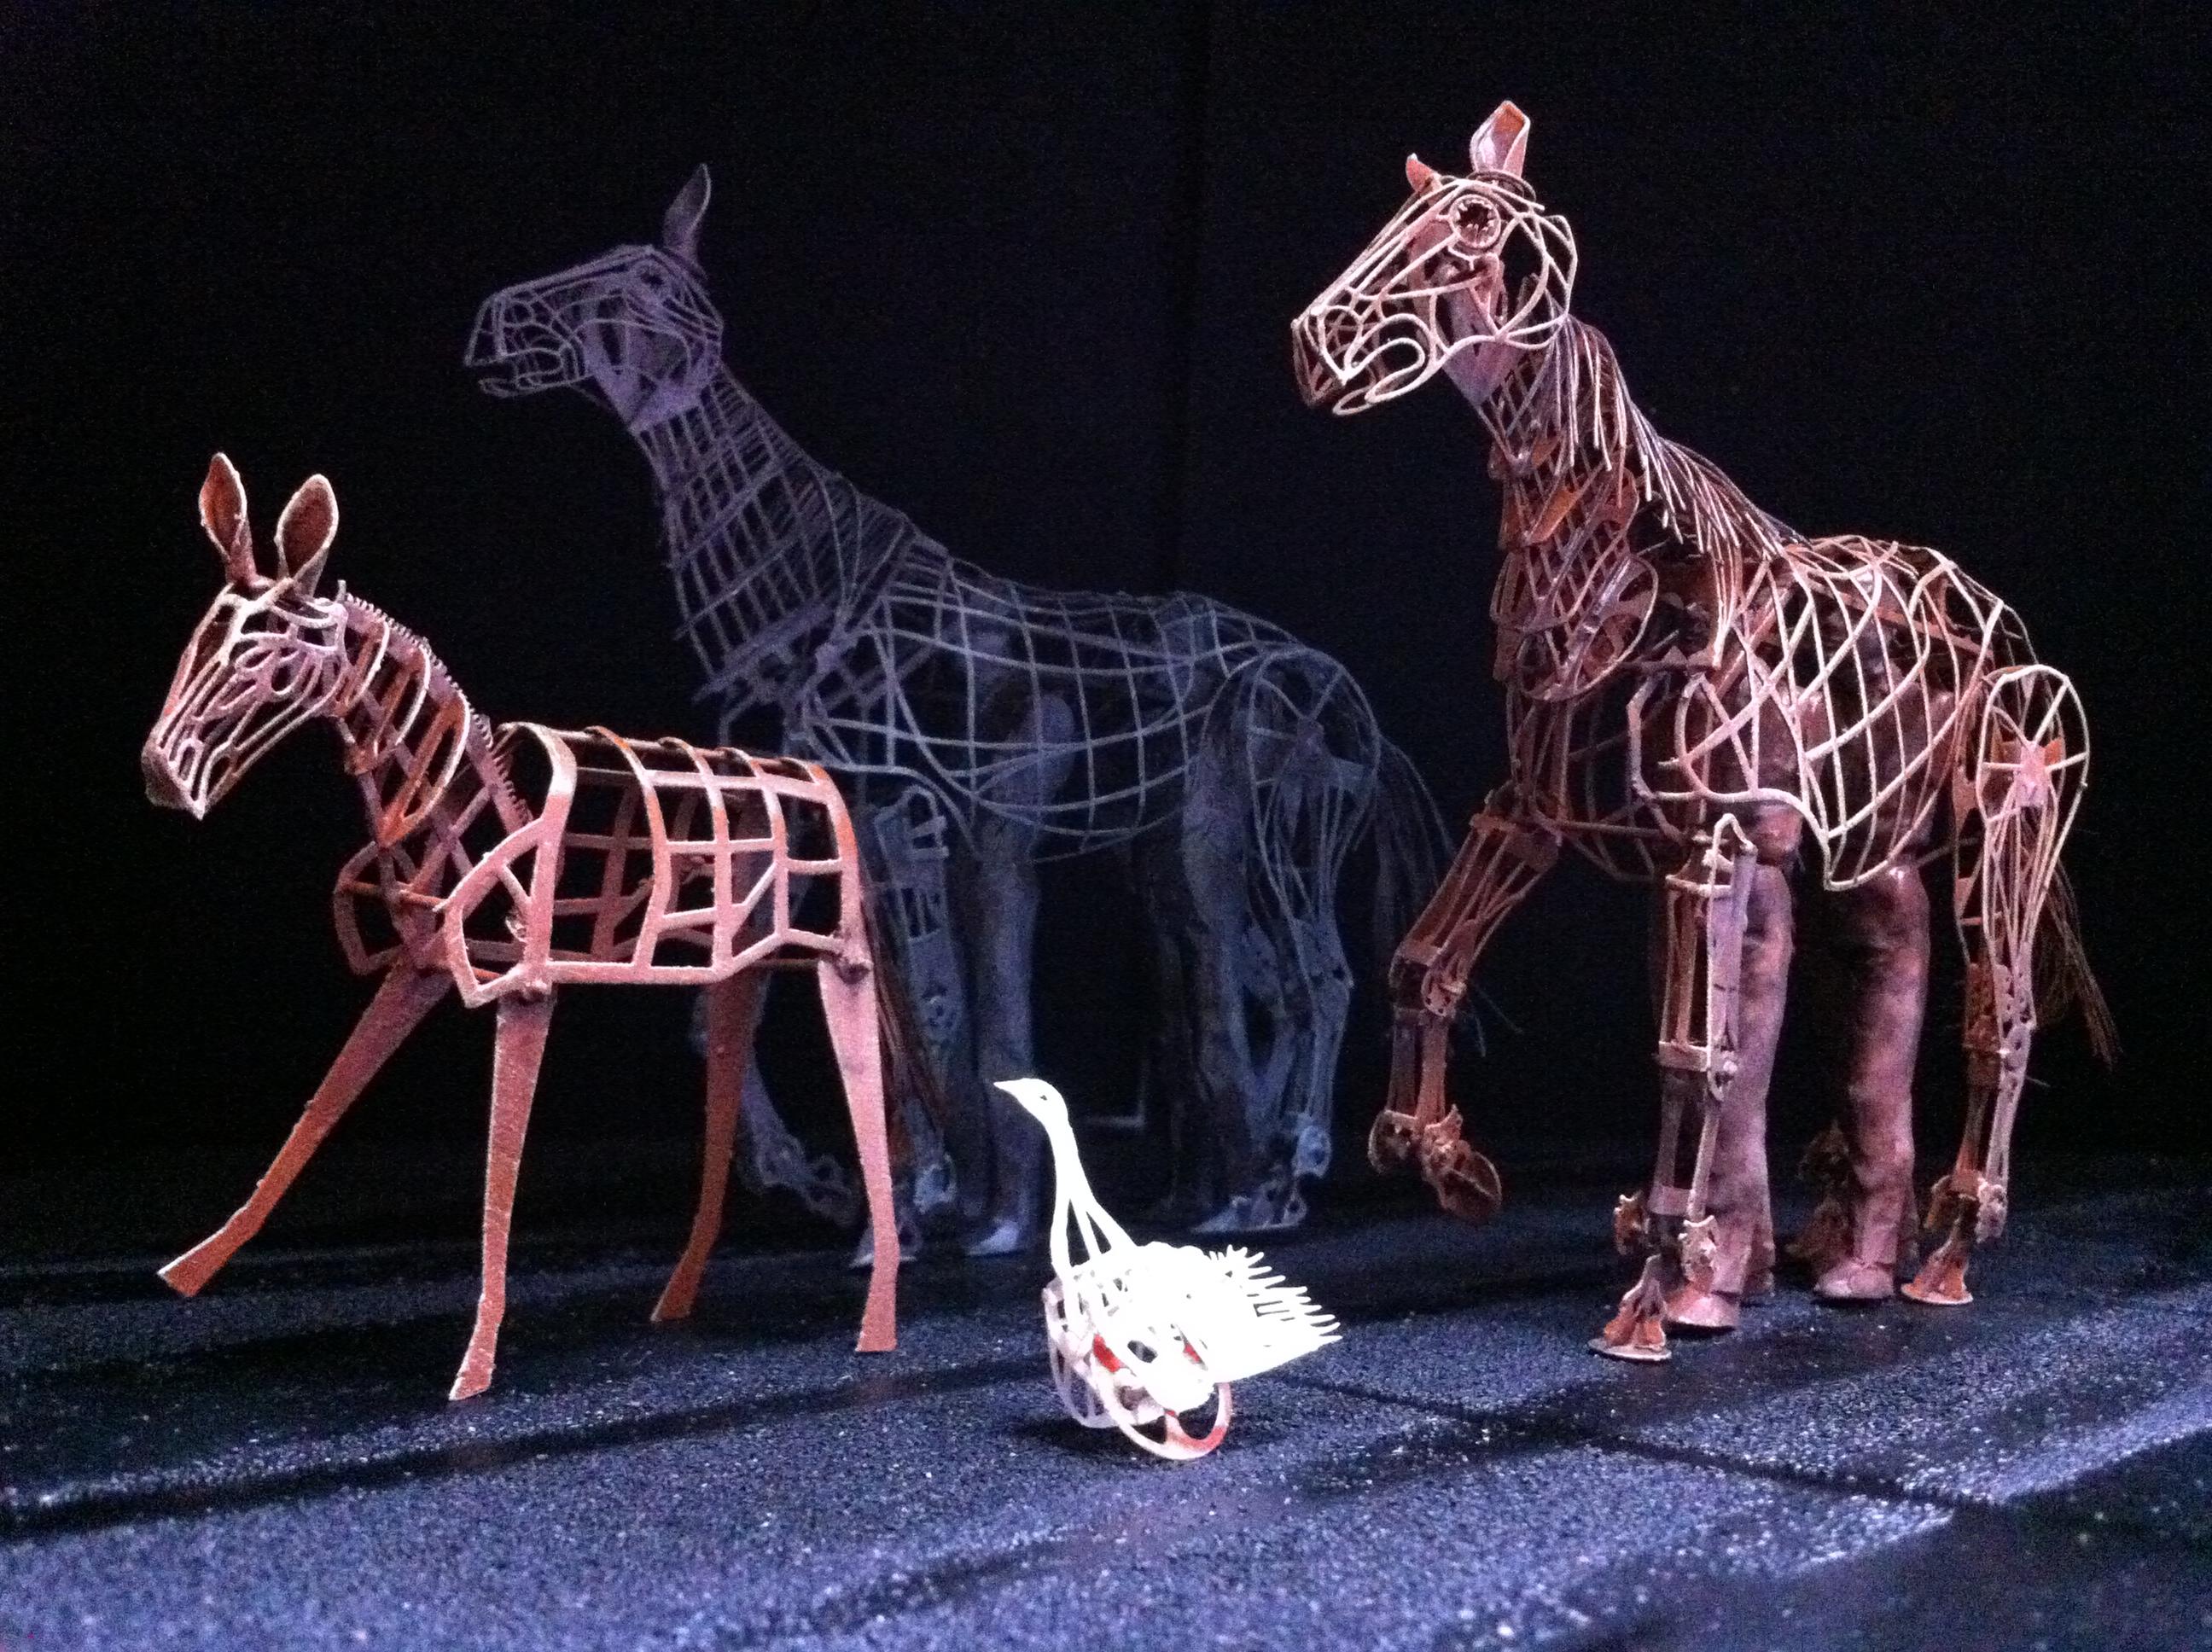 WarHorse scale model horses